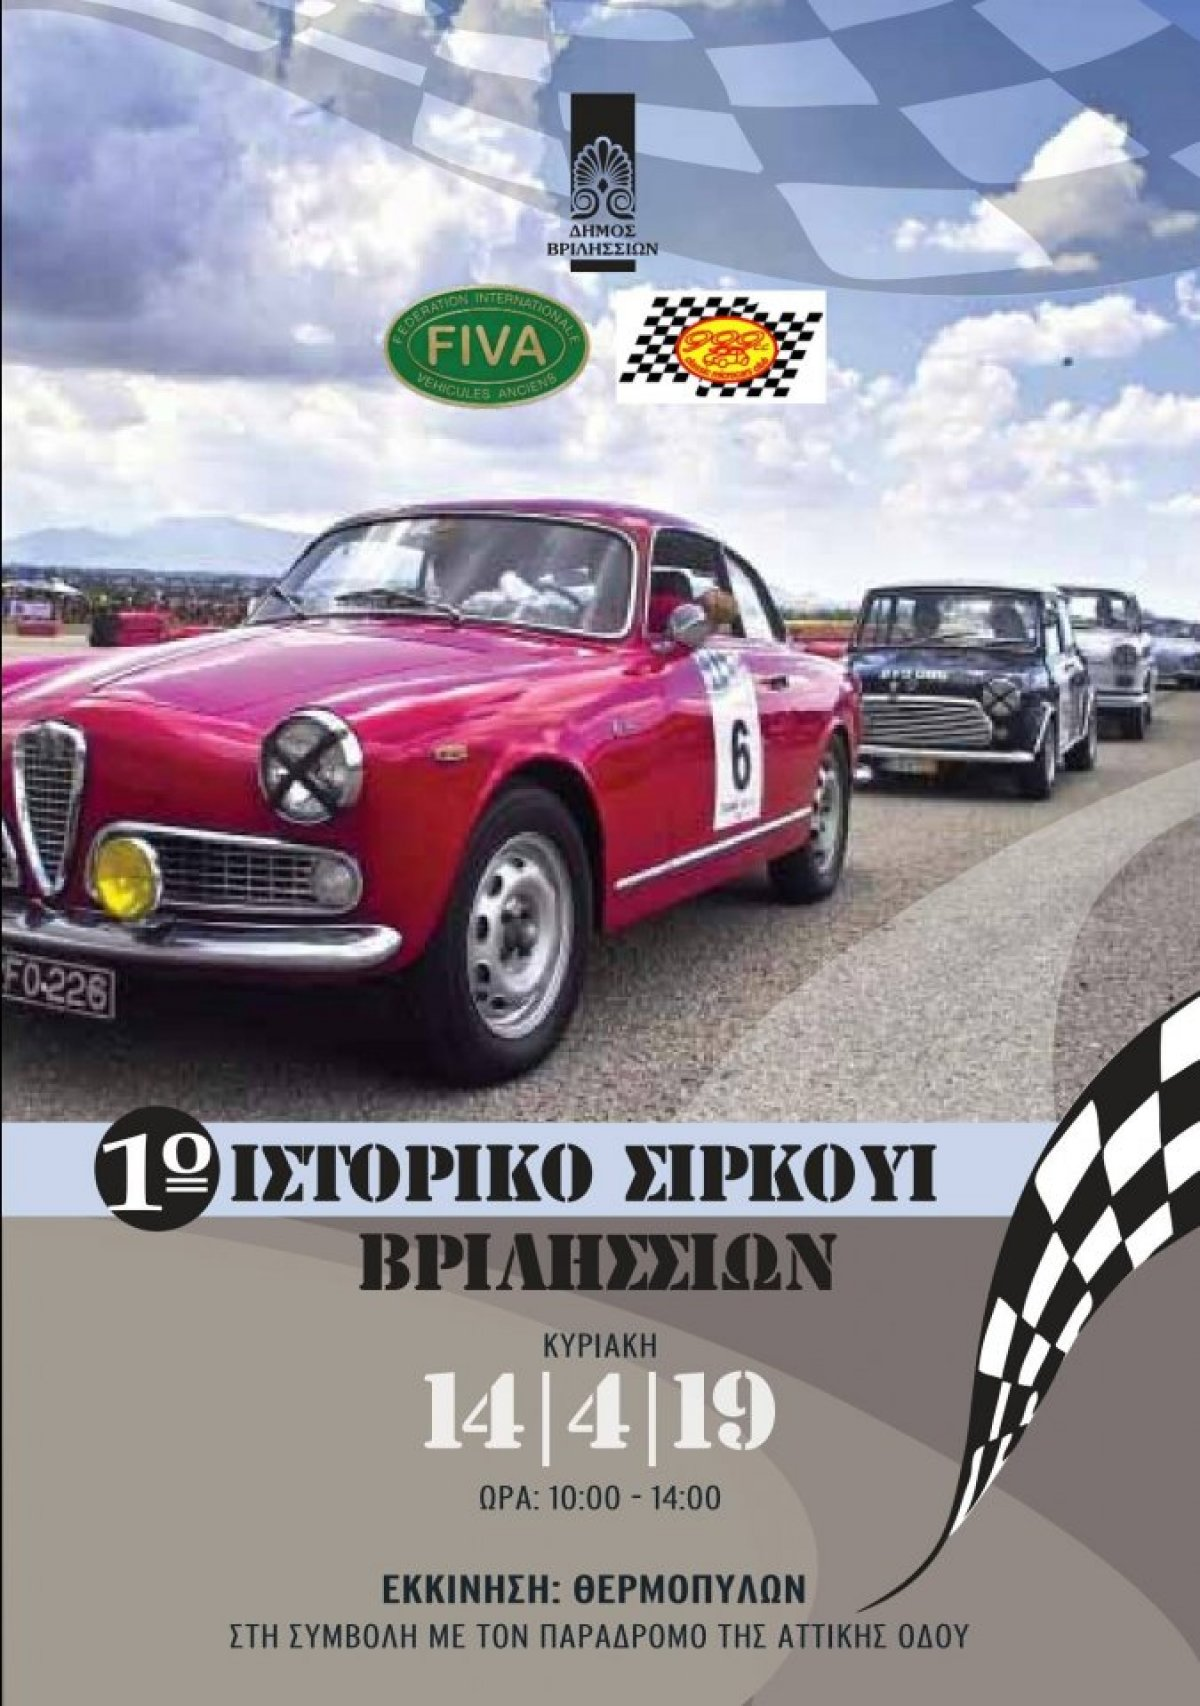 Classic Microcars Club: 1ο Ιστορικό Circuit Βριλησσίων